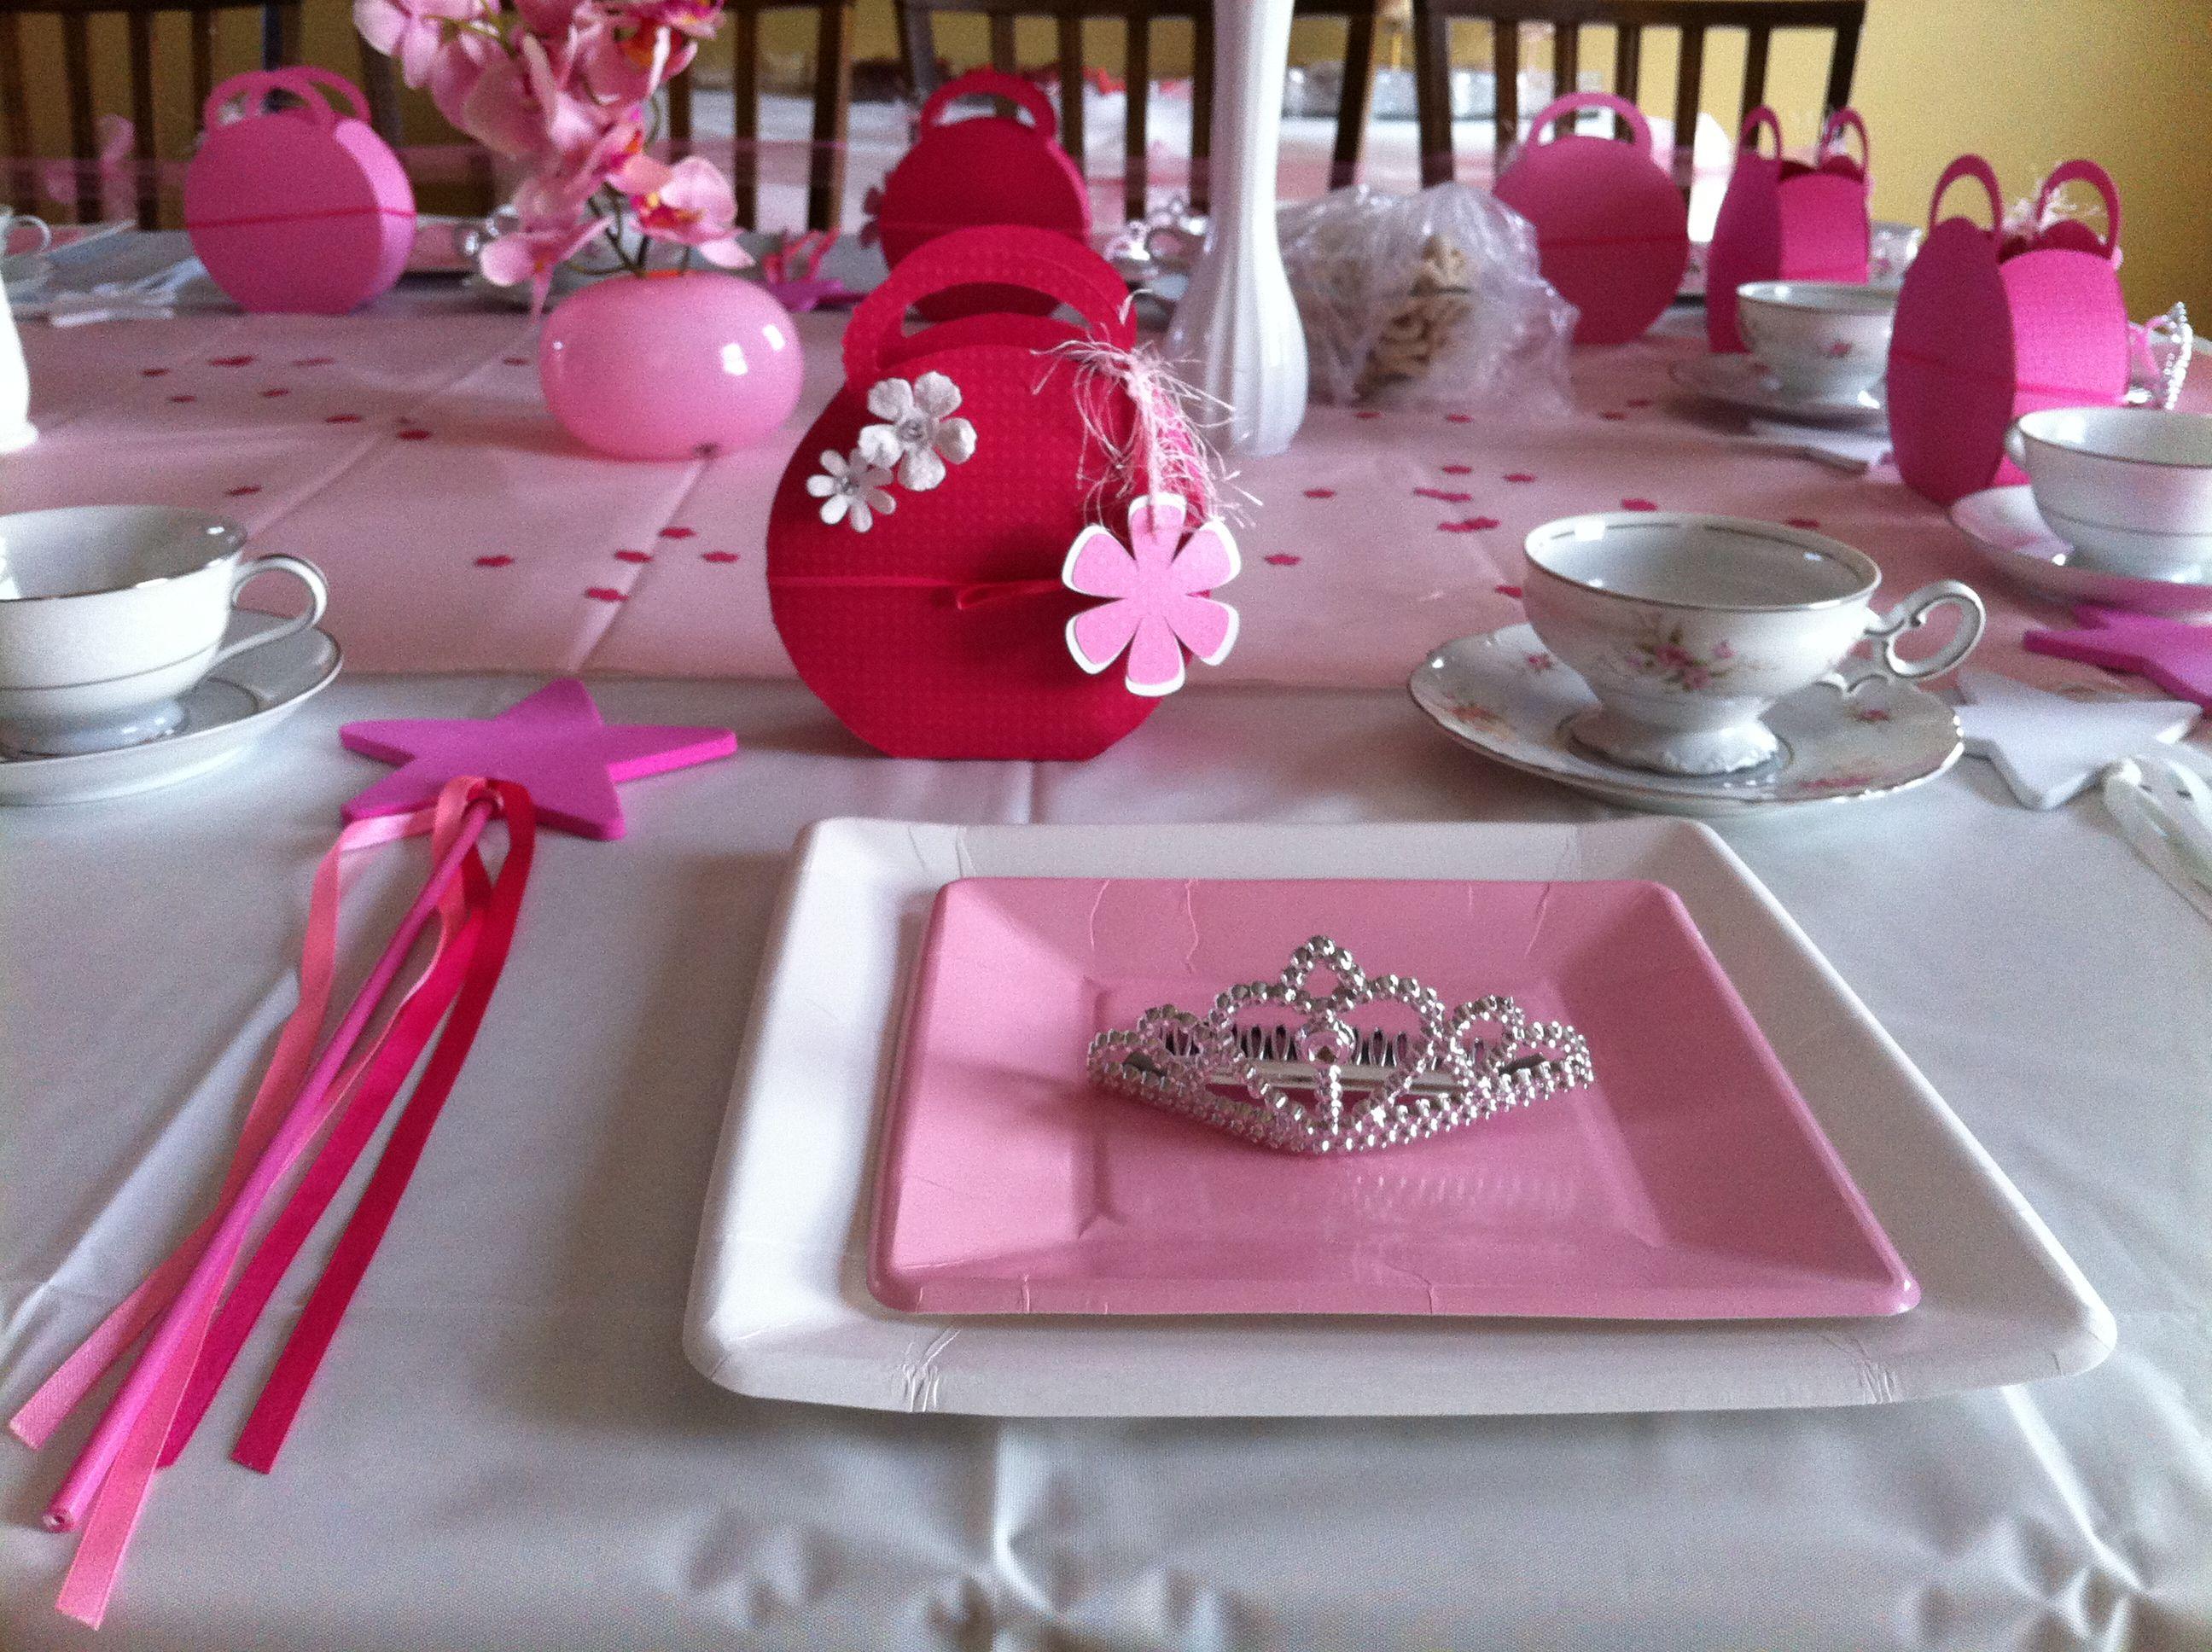 Kids tea party table - Princess Tea Party Table Setting